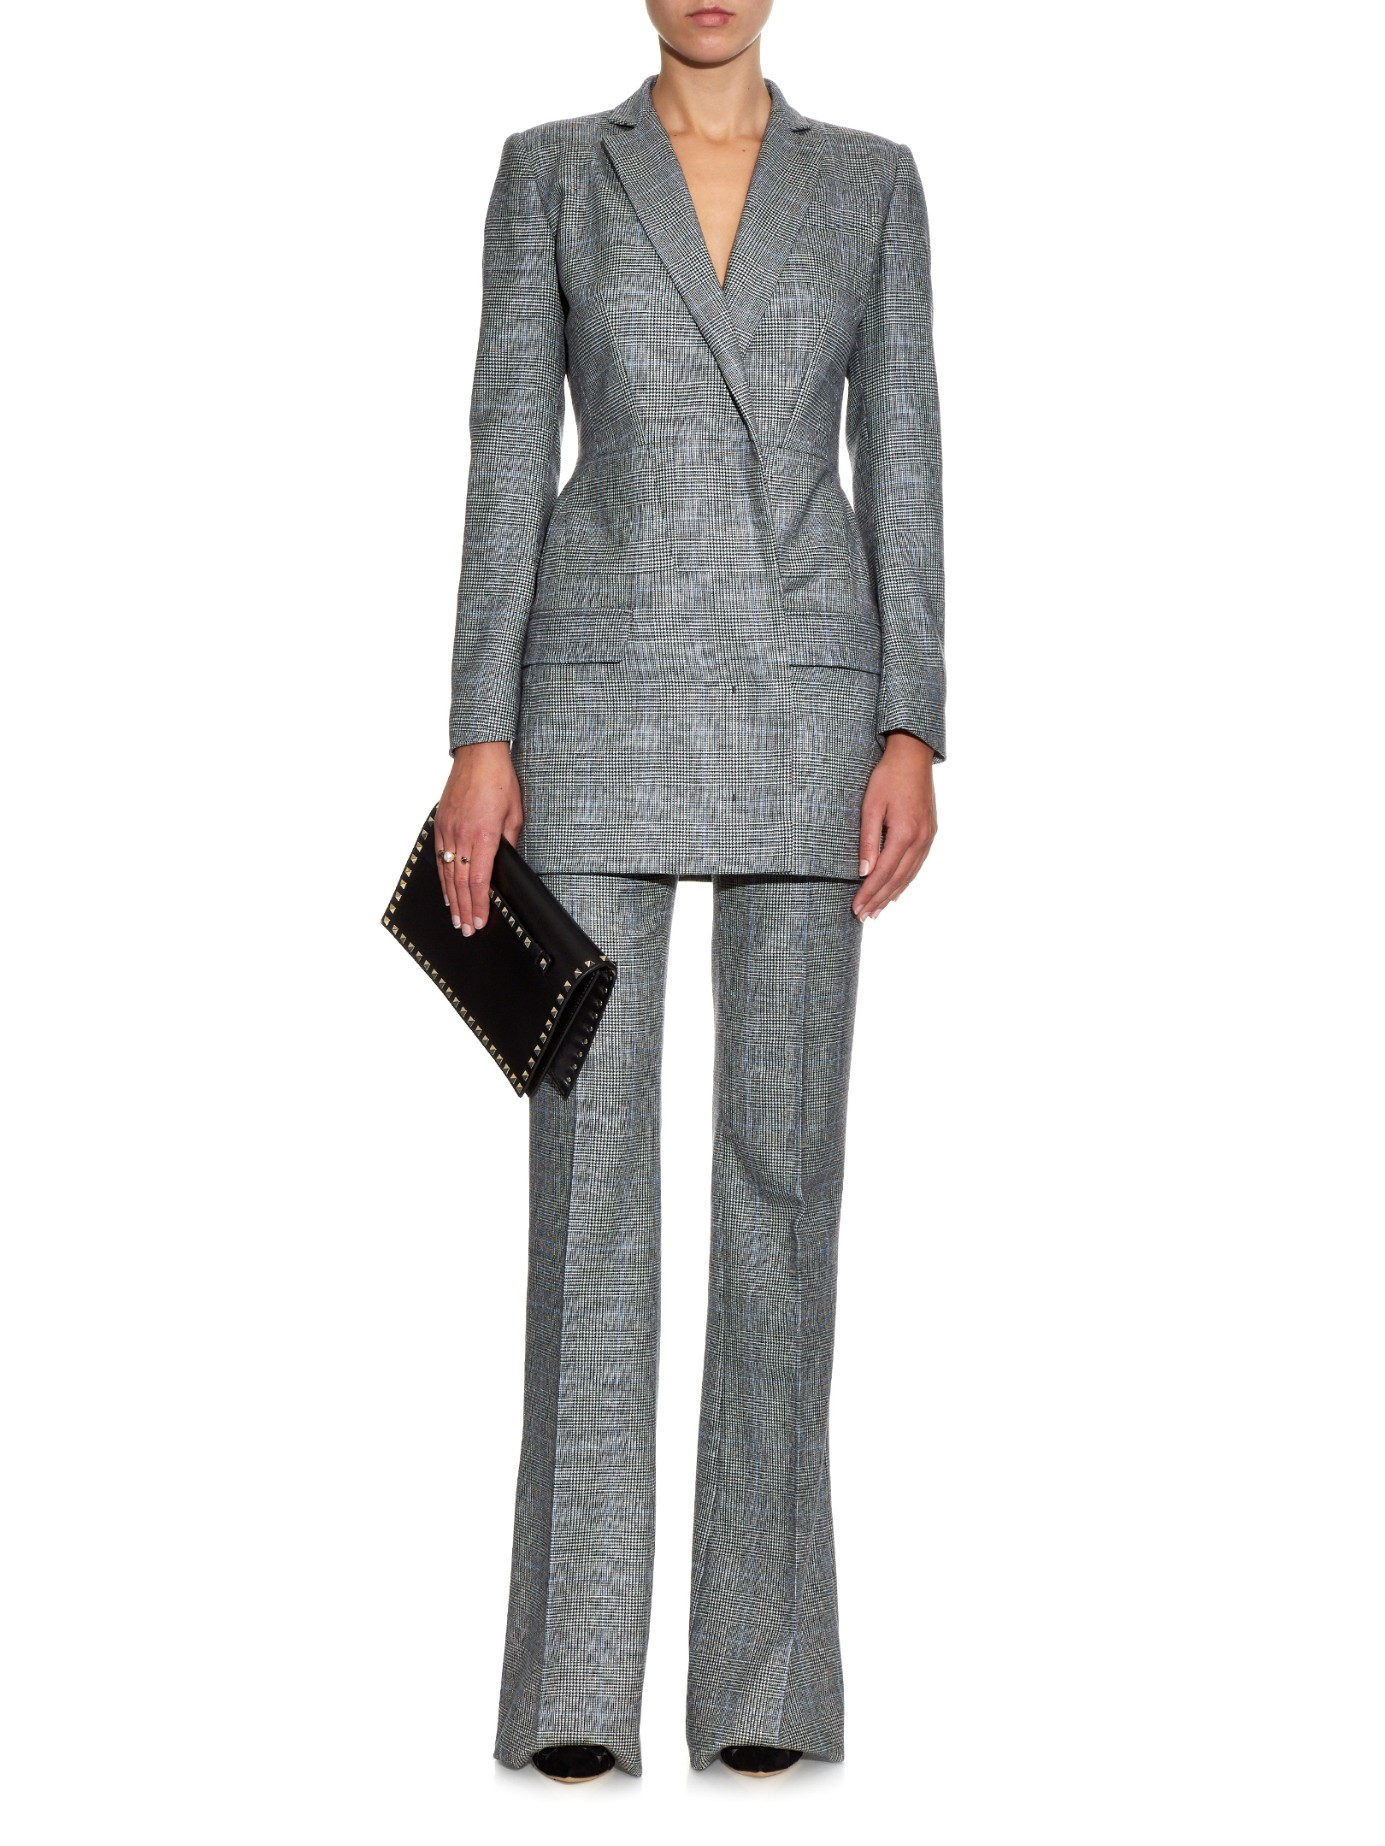 Lyst Antonio Berardi Prince Of Wales Check Wool Trousers